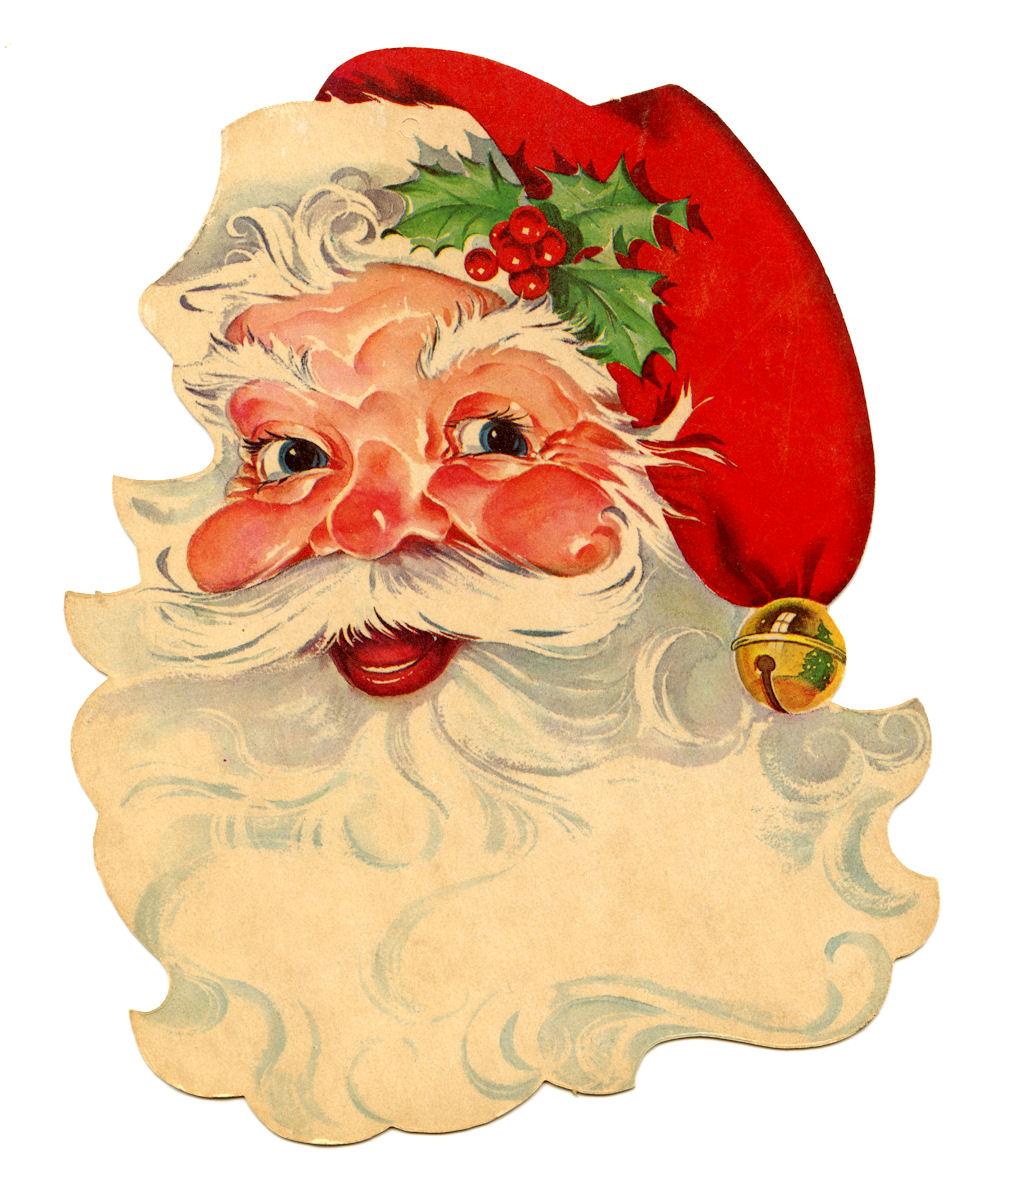 Free Vintage Clip Art U2013 Santa, Santa-Free Vintage Clip Art u2013 Santa, Santa, Santa!-12